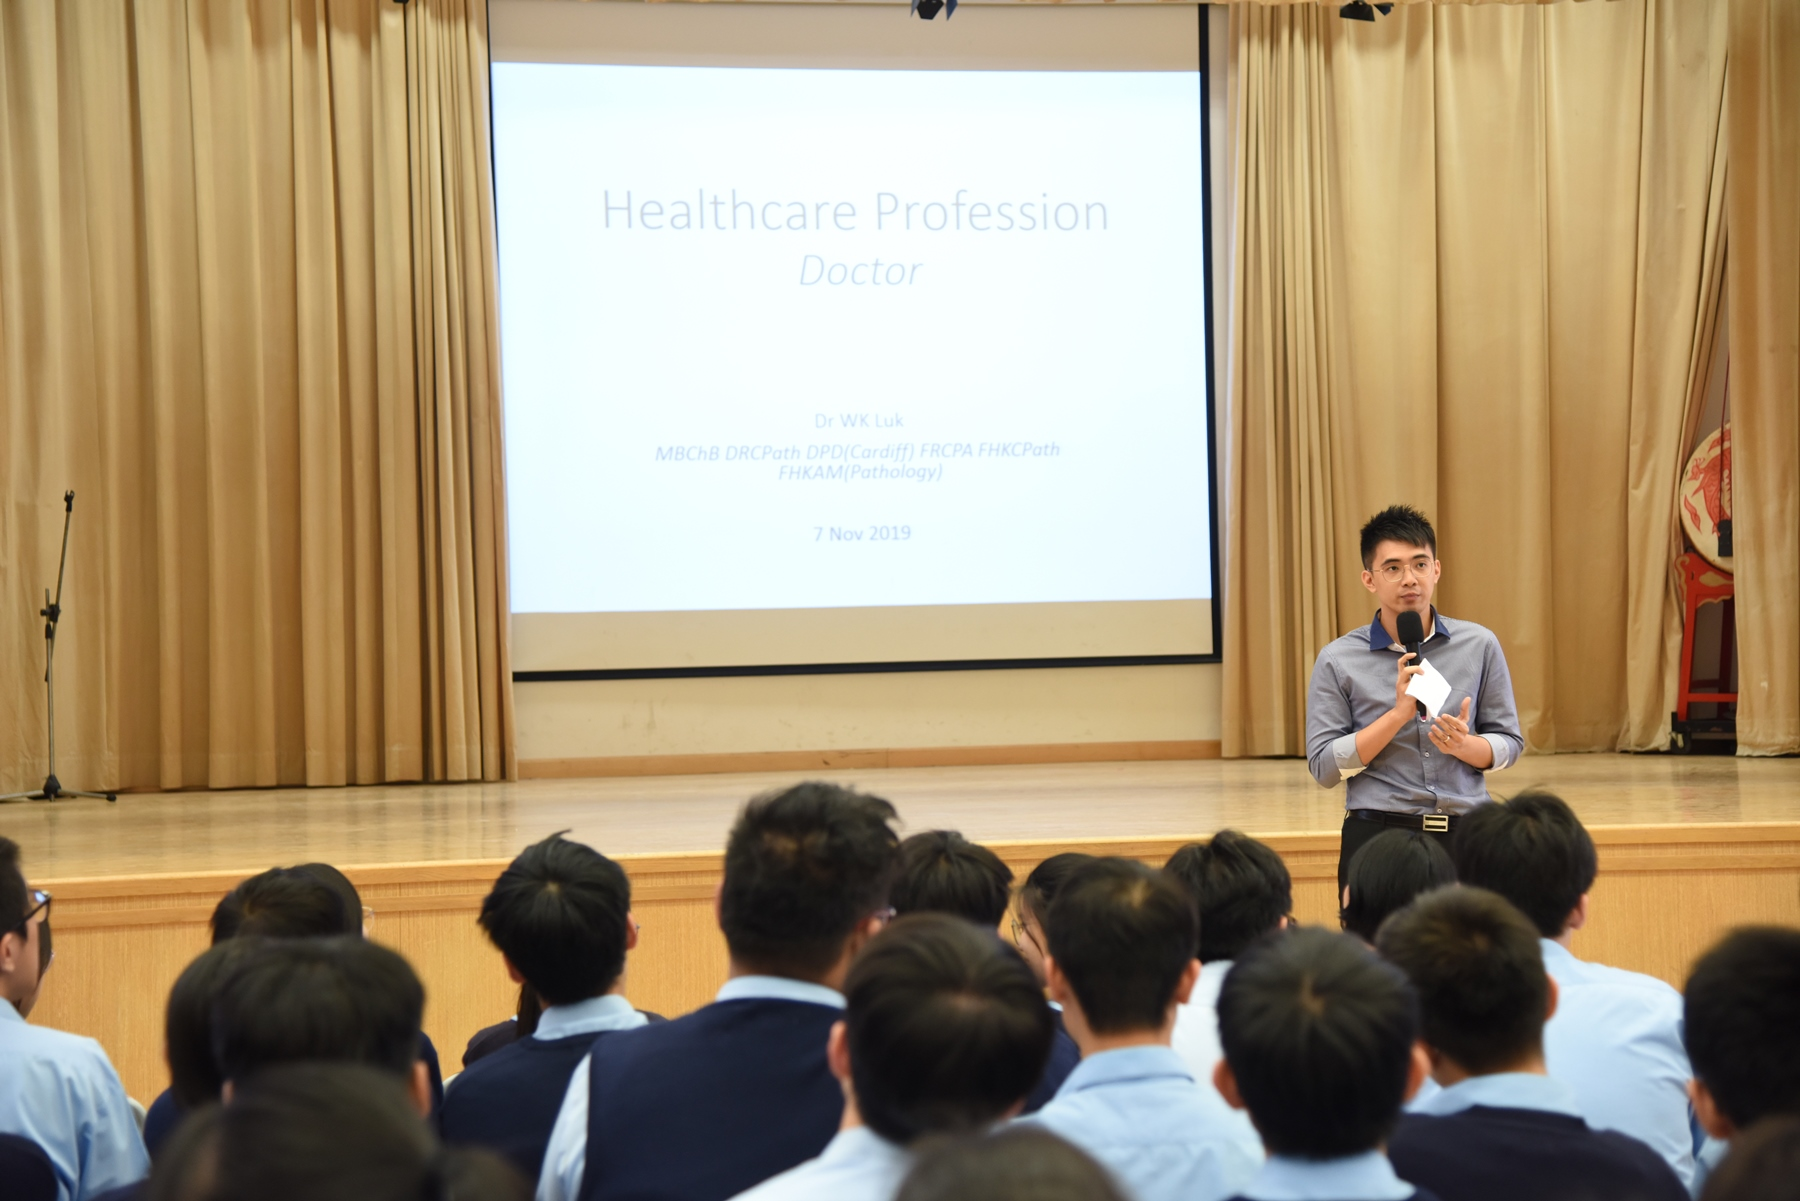 http://npc.edu.hk/sites/default/files/dsc_2472.jpg